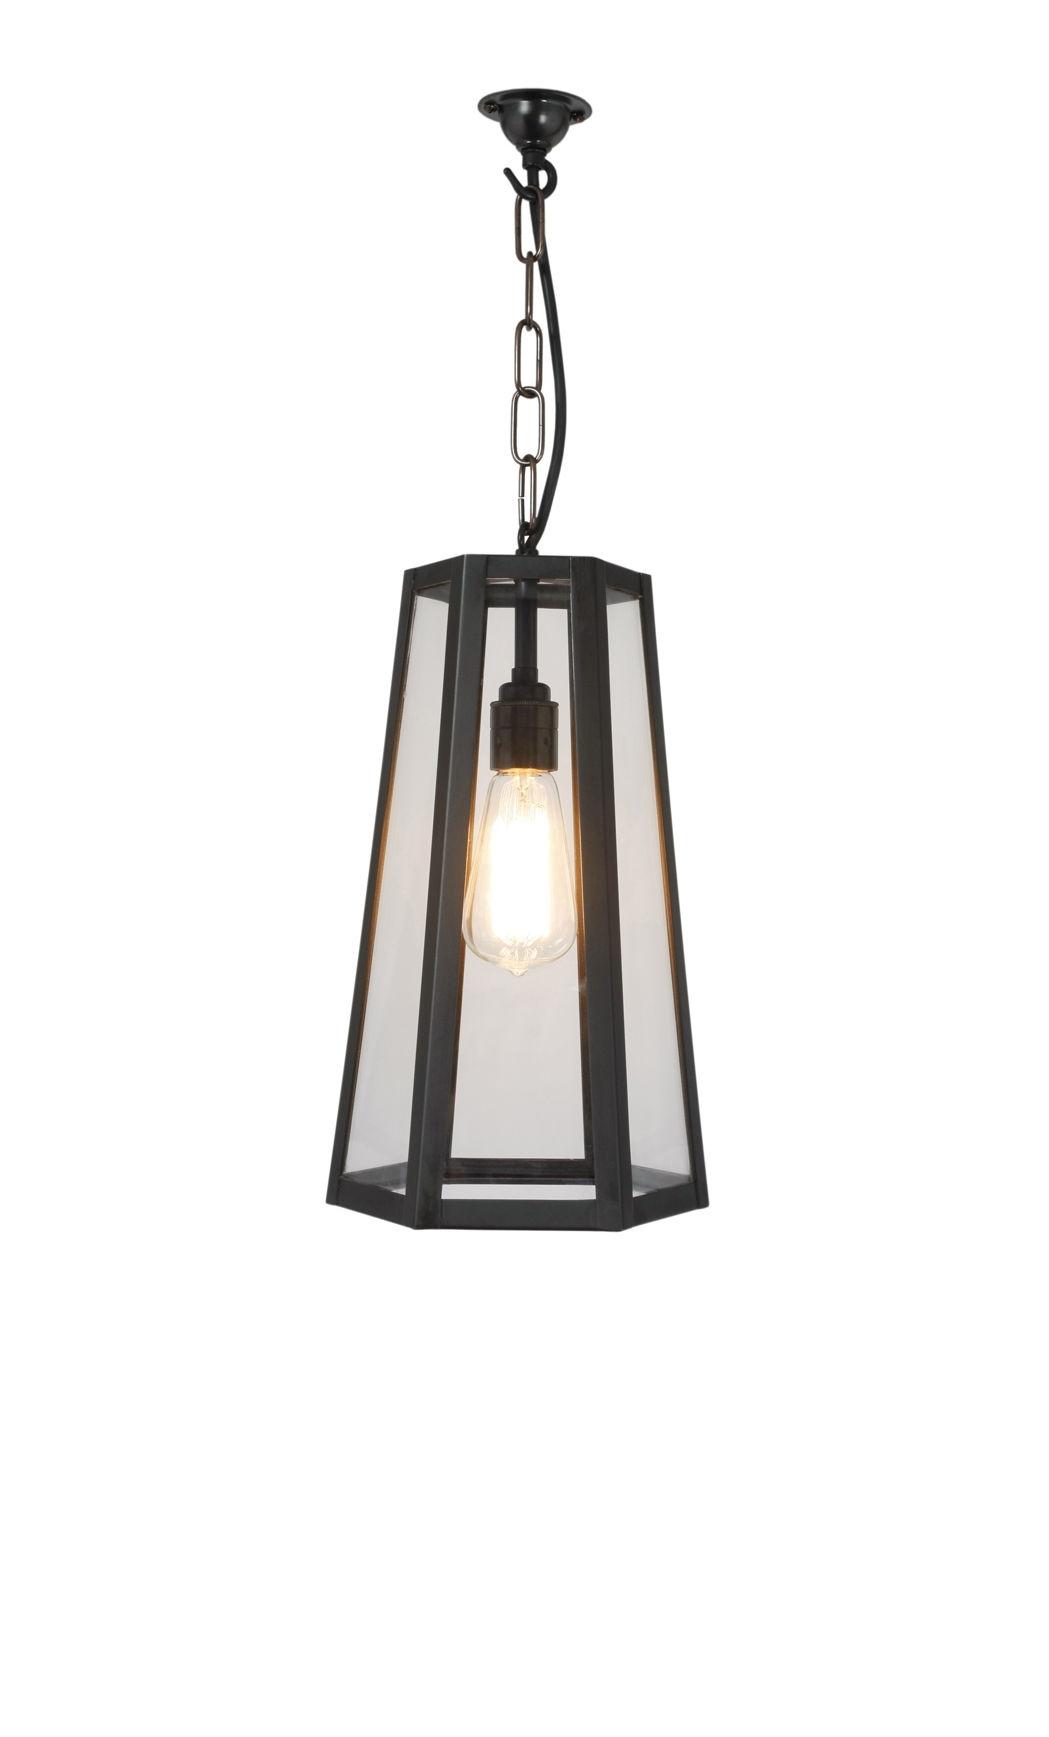 Illuminazione - Lampadari - Sospensione Hex - / H 35 cm - Metallo & vetro di Original BTC - nero & trasparente - Laiton vielli, Vetro